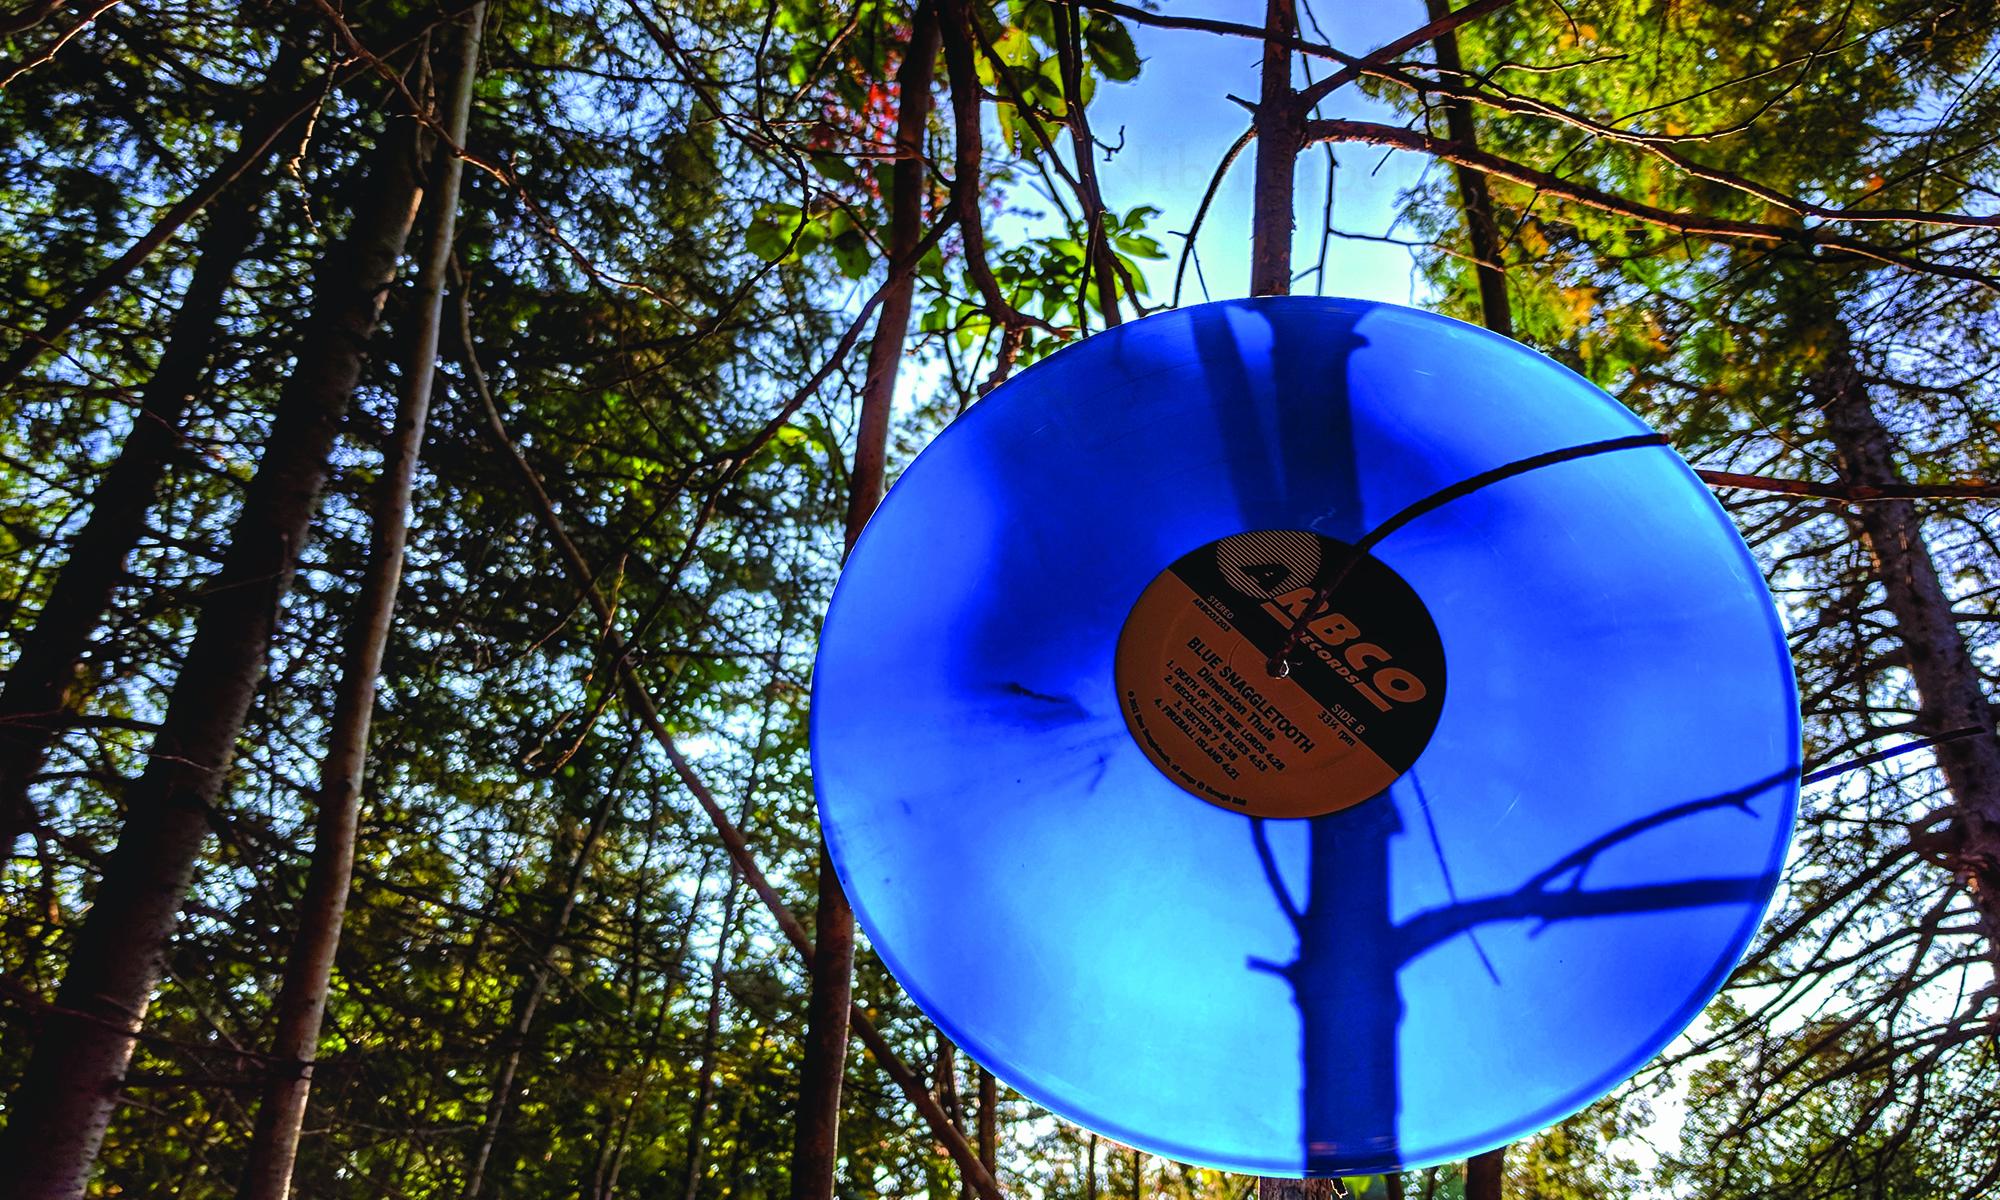 Blue Vinyl LP Review Photo In Tree